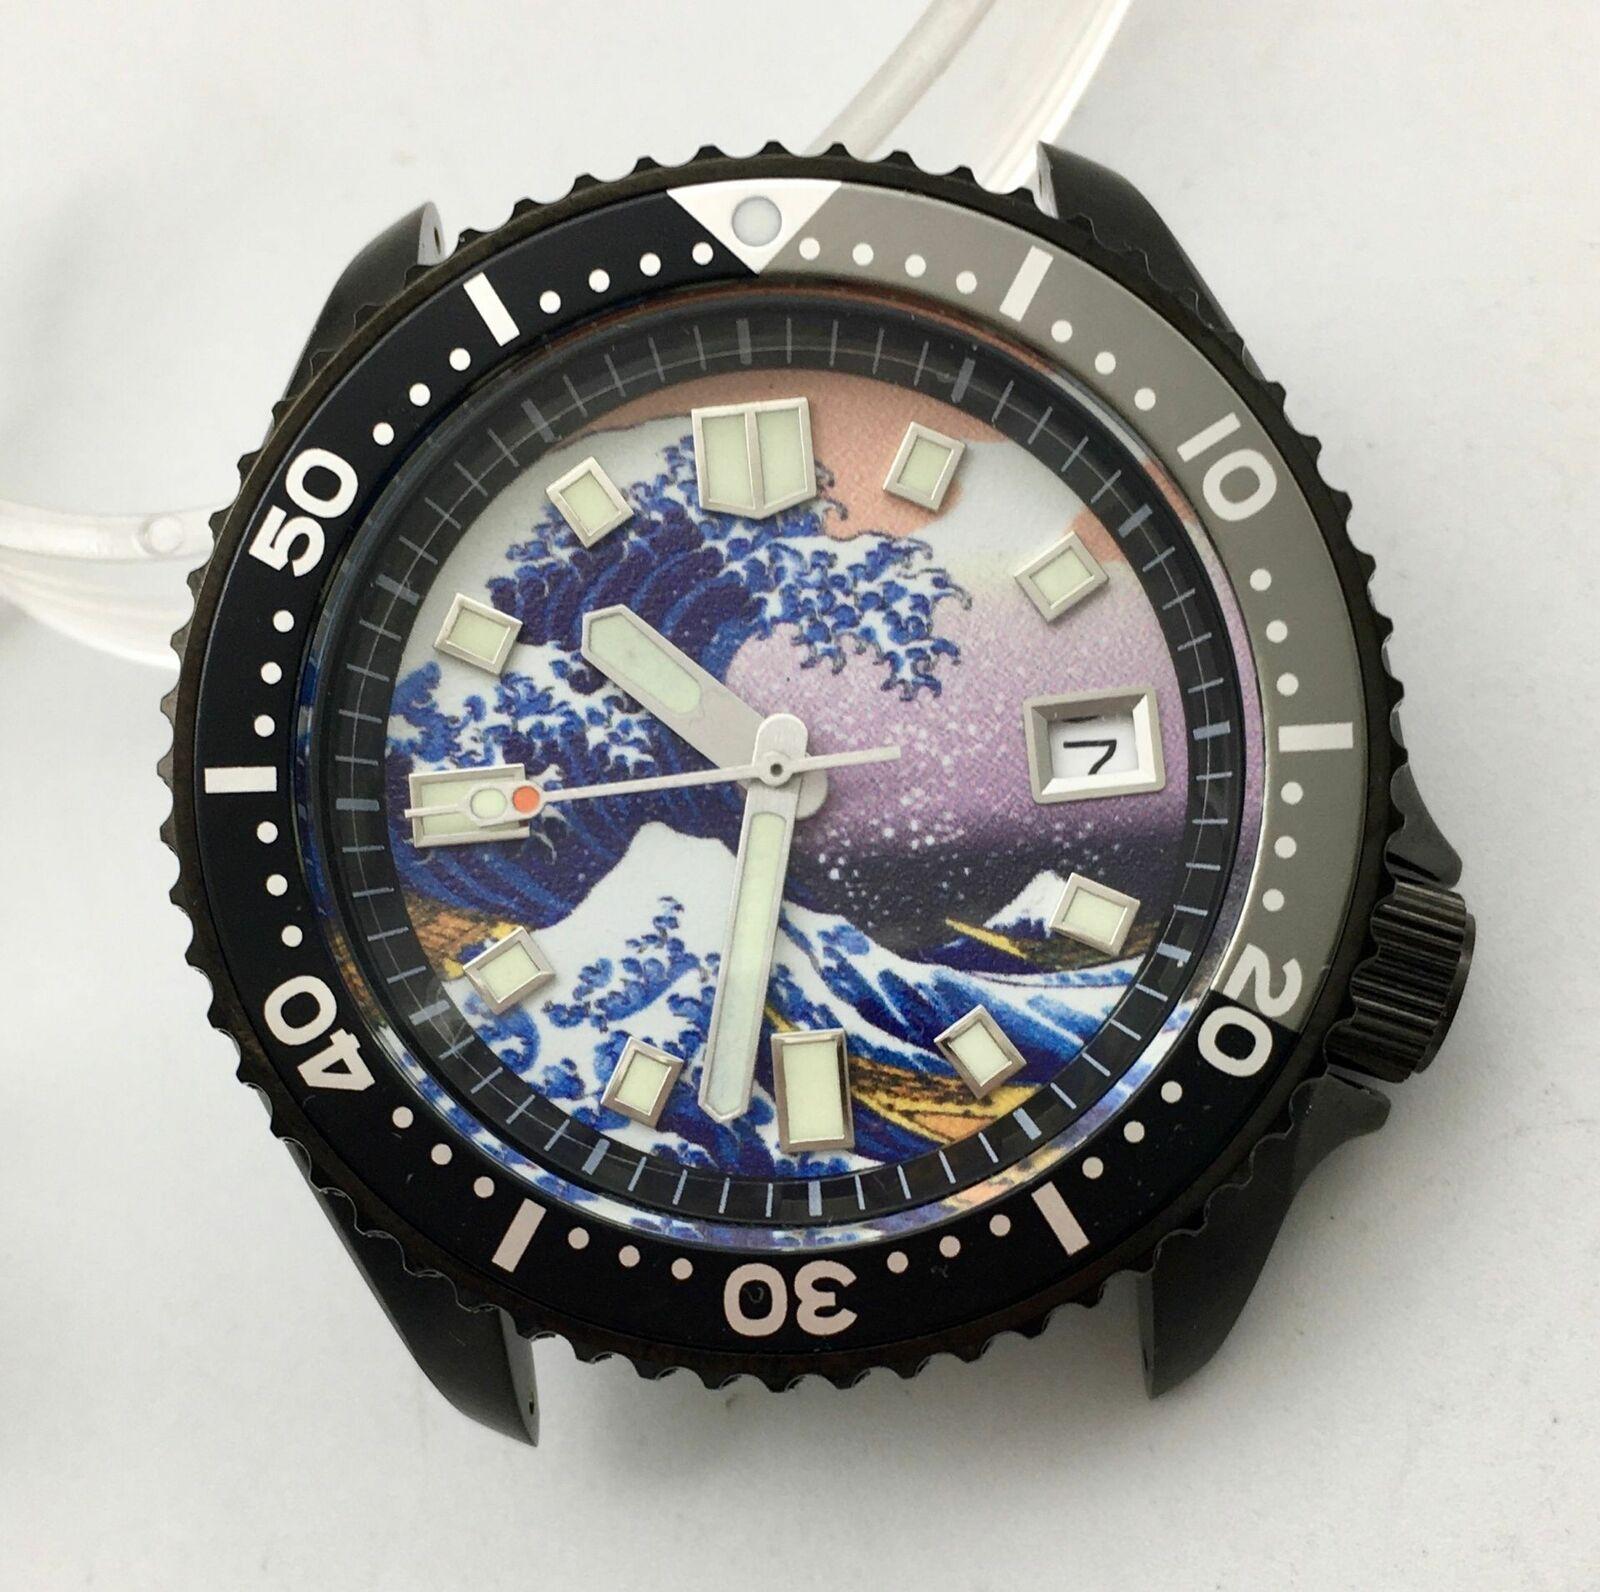 42MM Fashion Men's Watch SK007 Black PVD Case Strong Luminous Dial NH35 Automatic Watch Men's Watch Mechanical